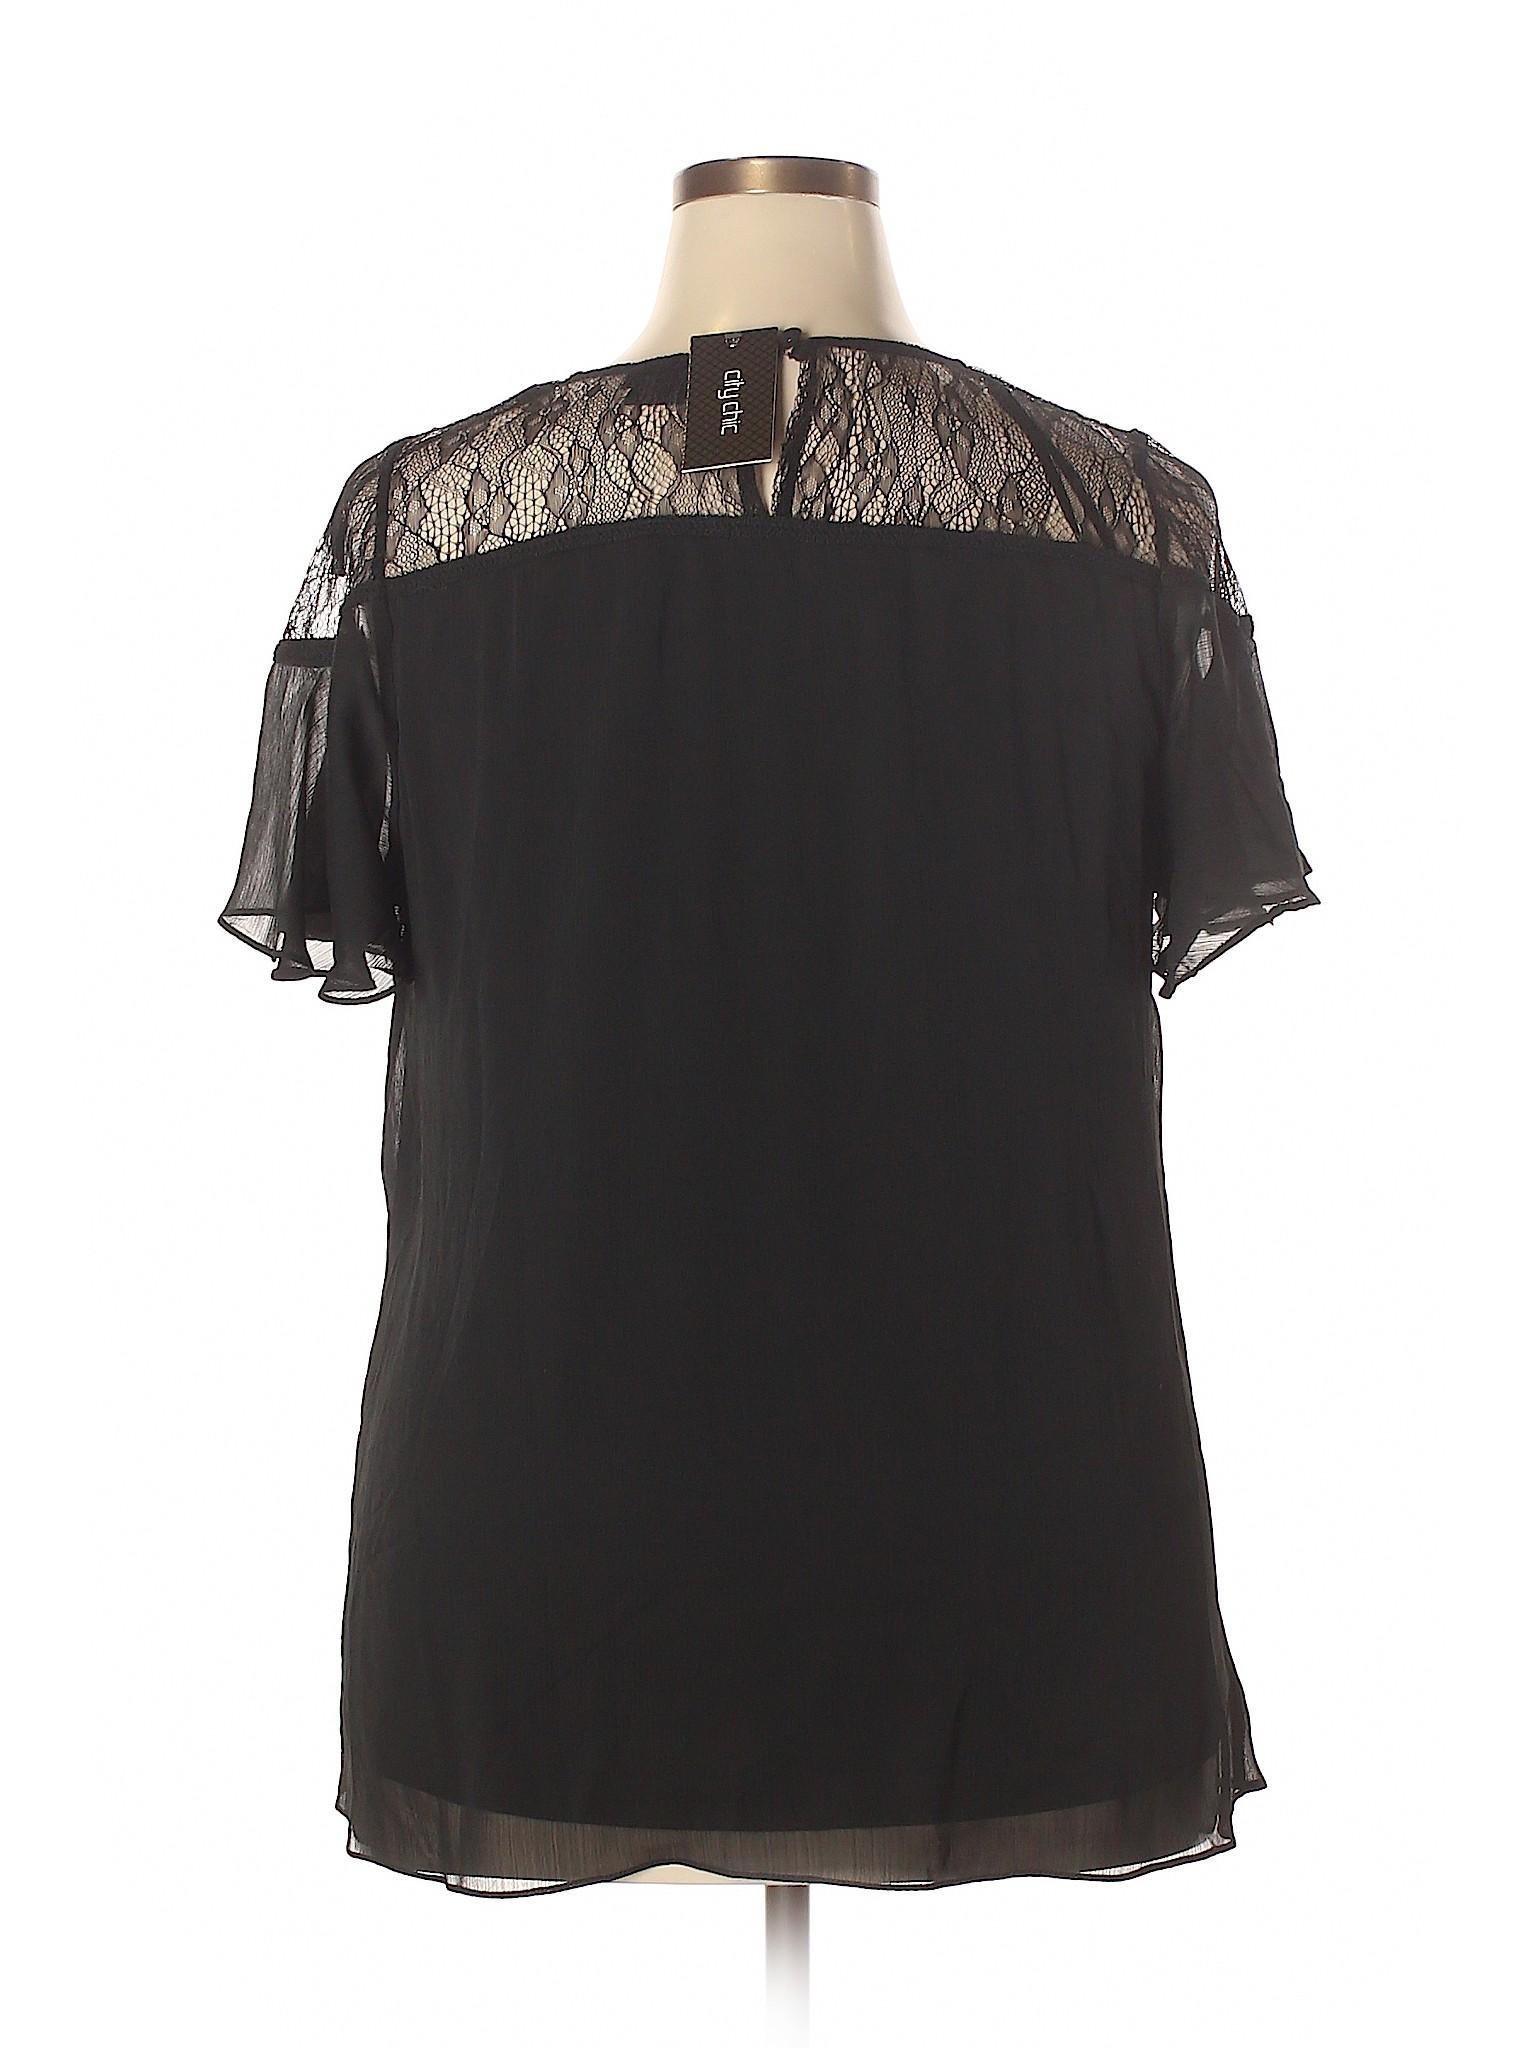 2174af31077ba Women's Clothing, Shoes & Handbags On Sale Up To 90% Off | thredUP